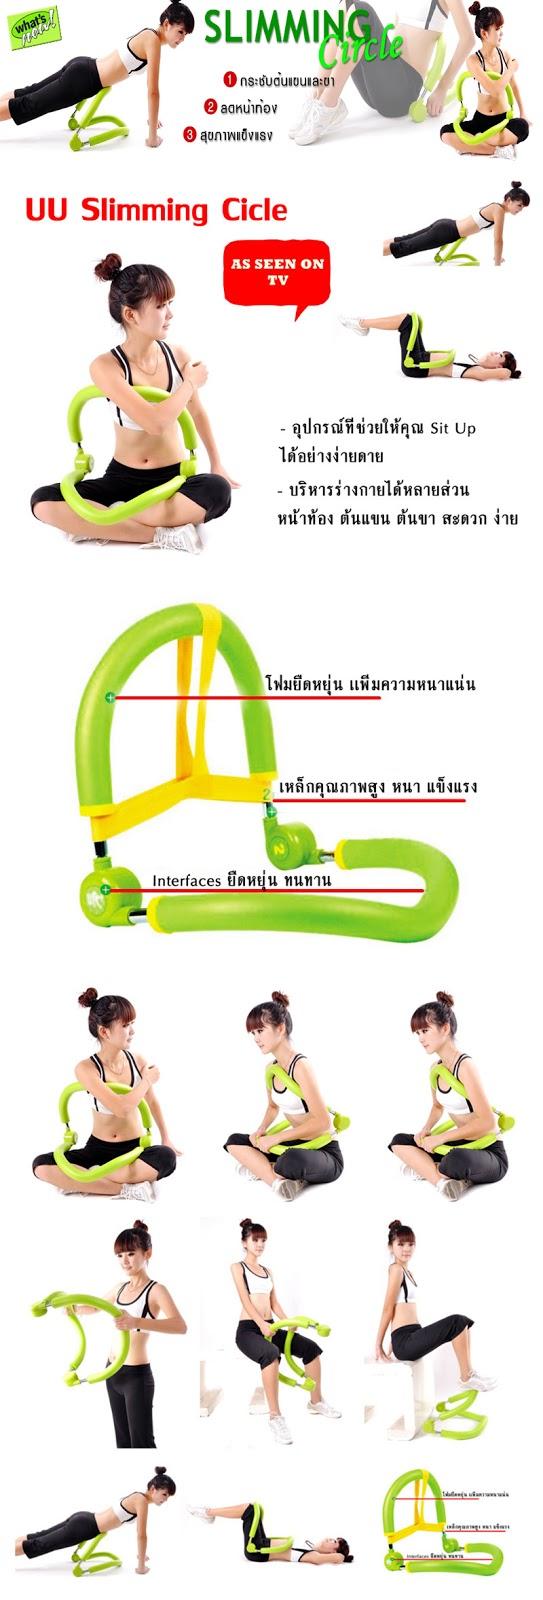 uu slimming circle)